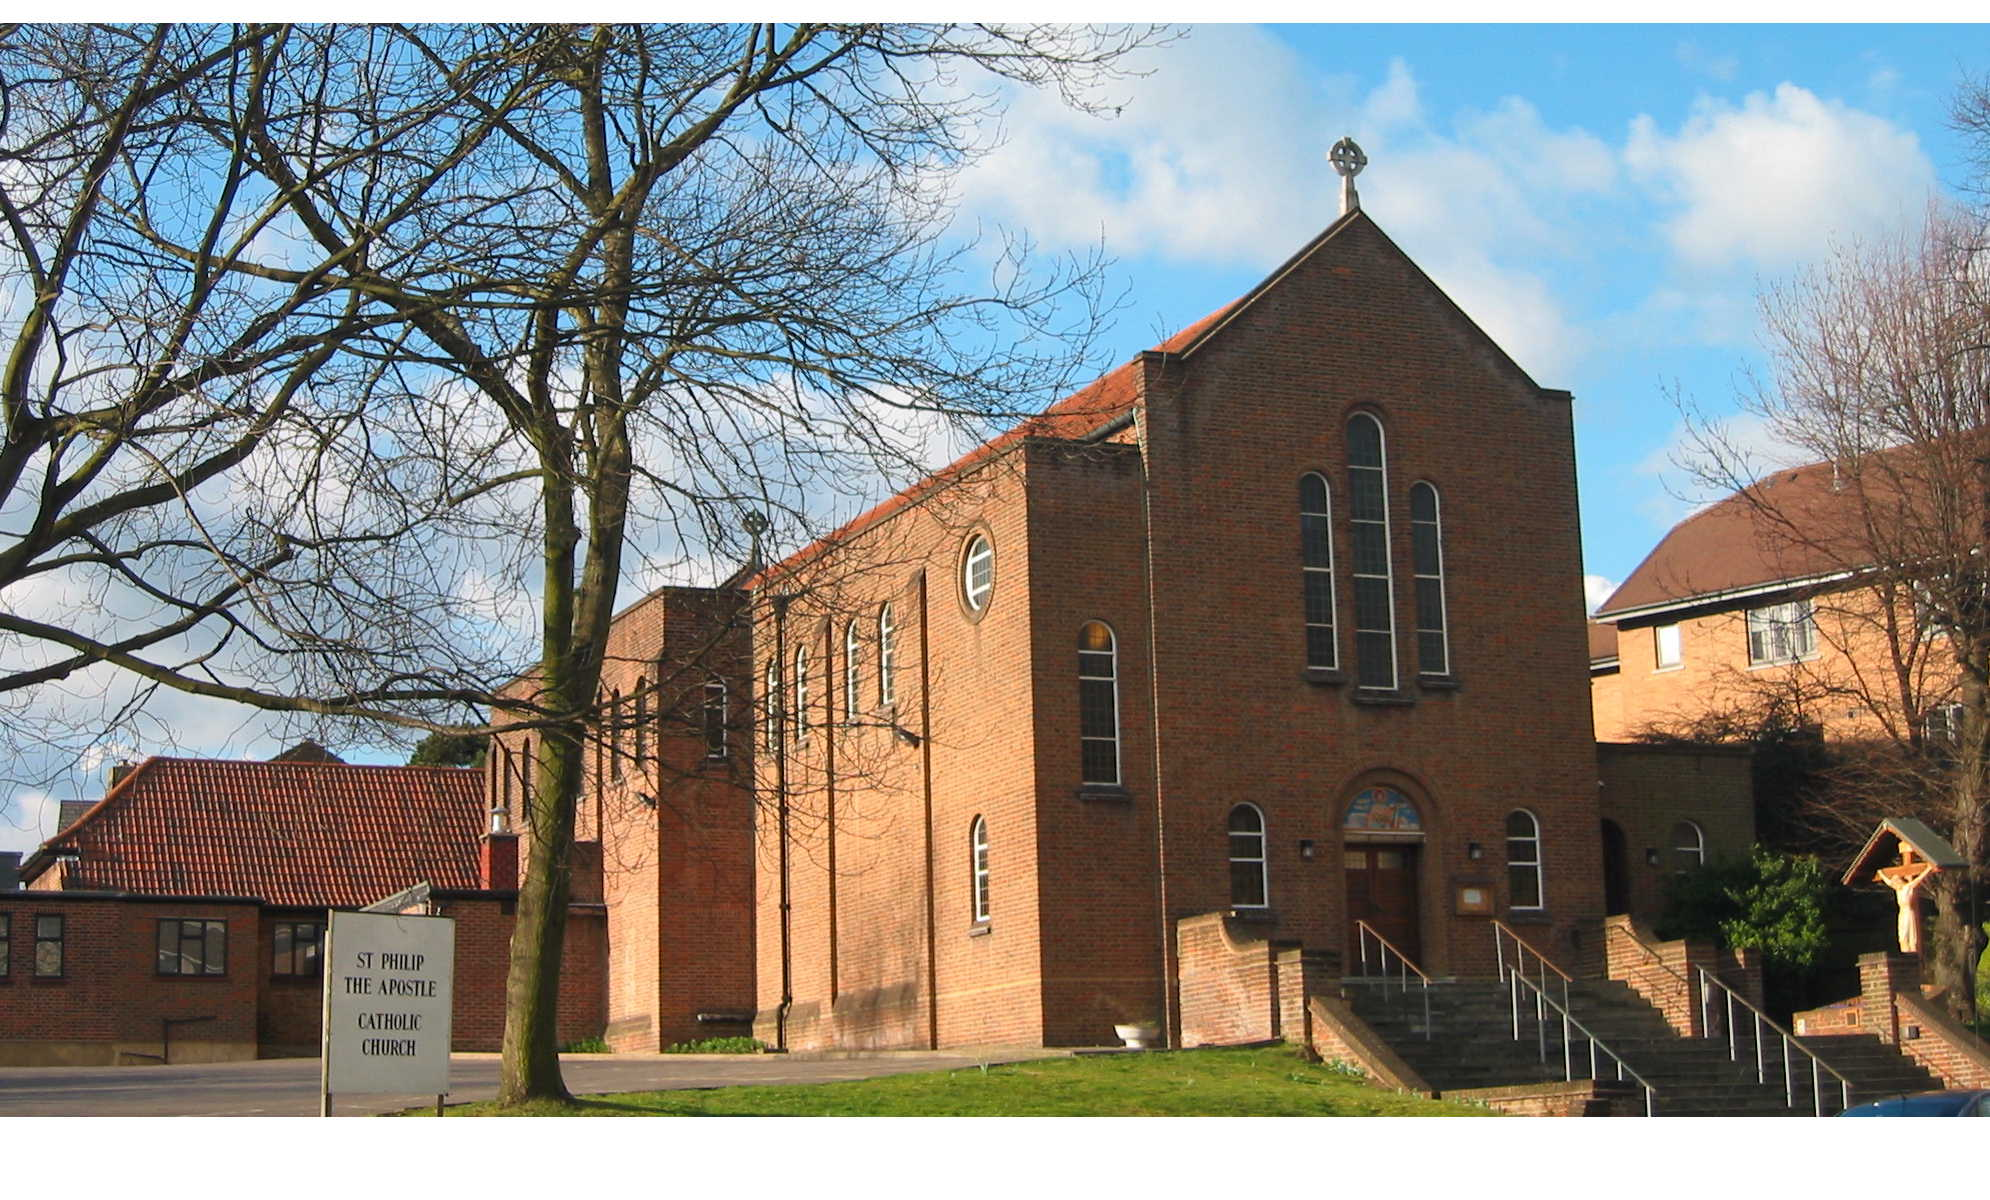 st_philip_the_apostle_church_building_centenary_mass.jpg